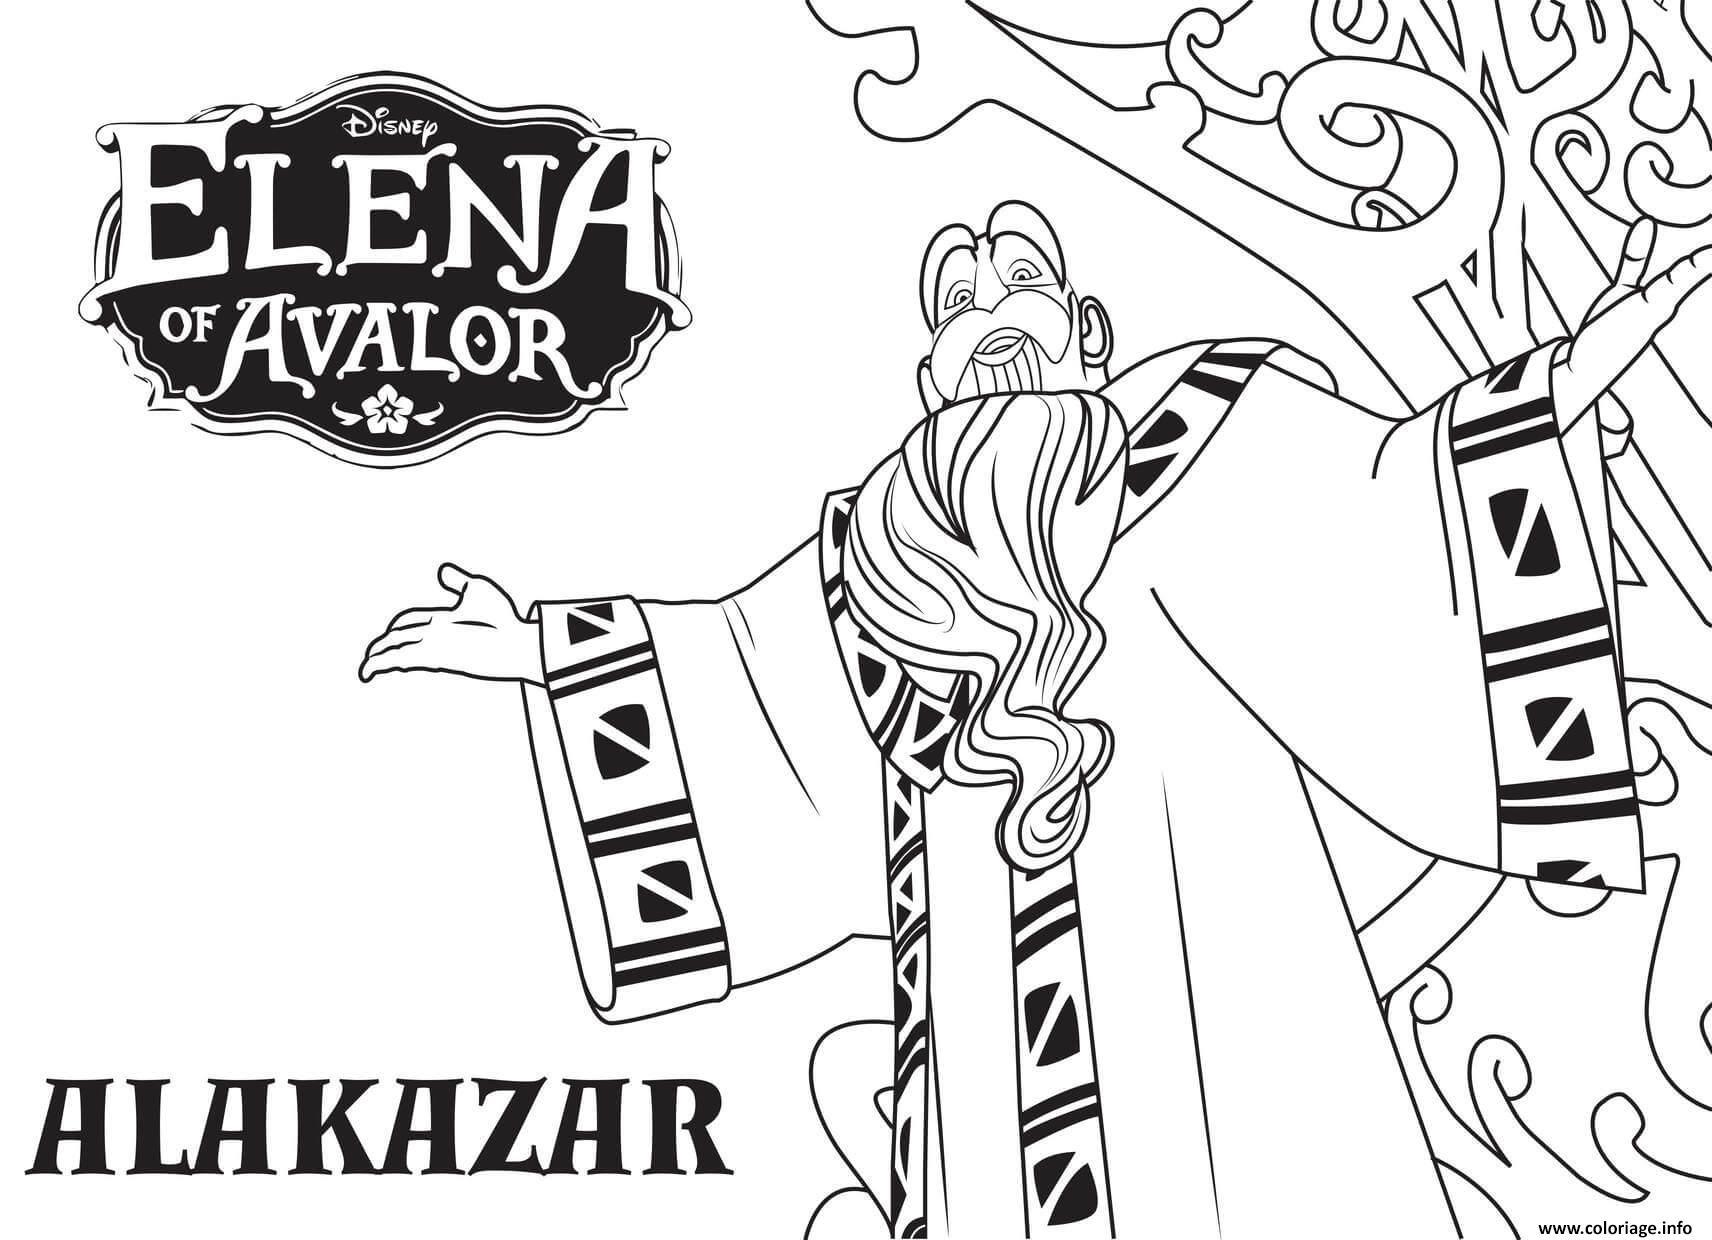 Dibujos Para Colorear De Disney Infinity: Coloriage Elena D Avalor Alakazar Disney Princesse Dessin